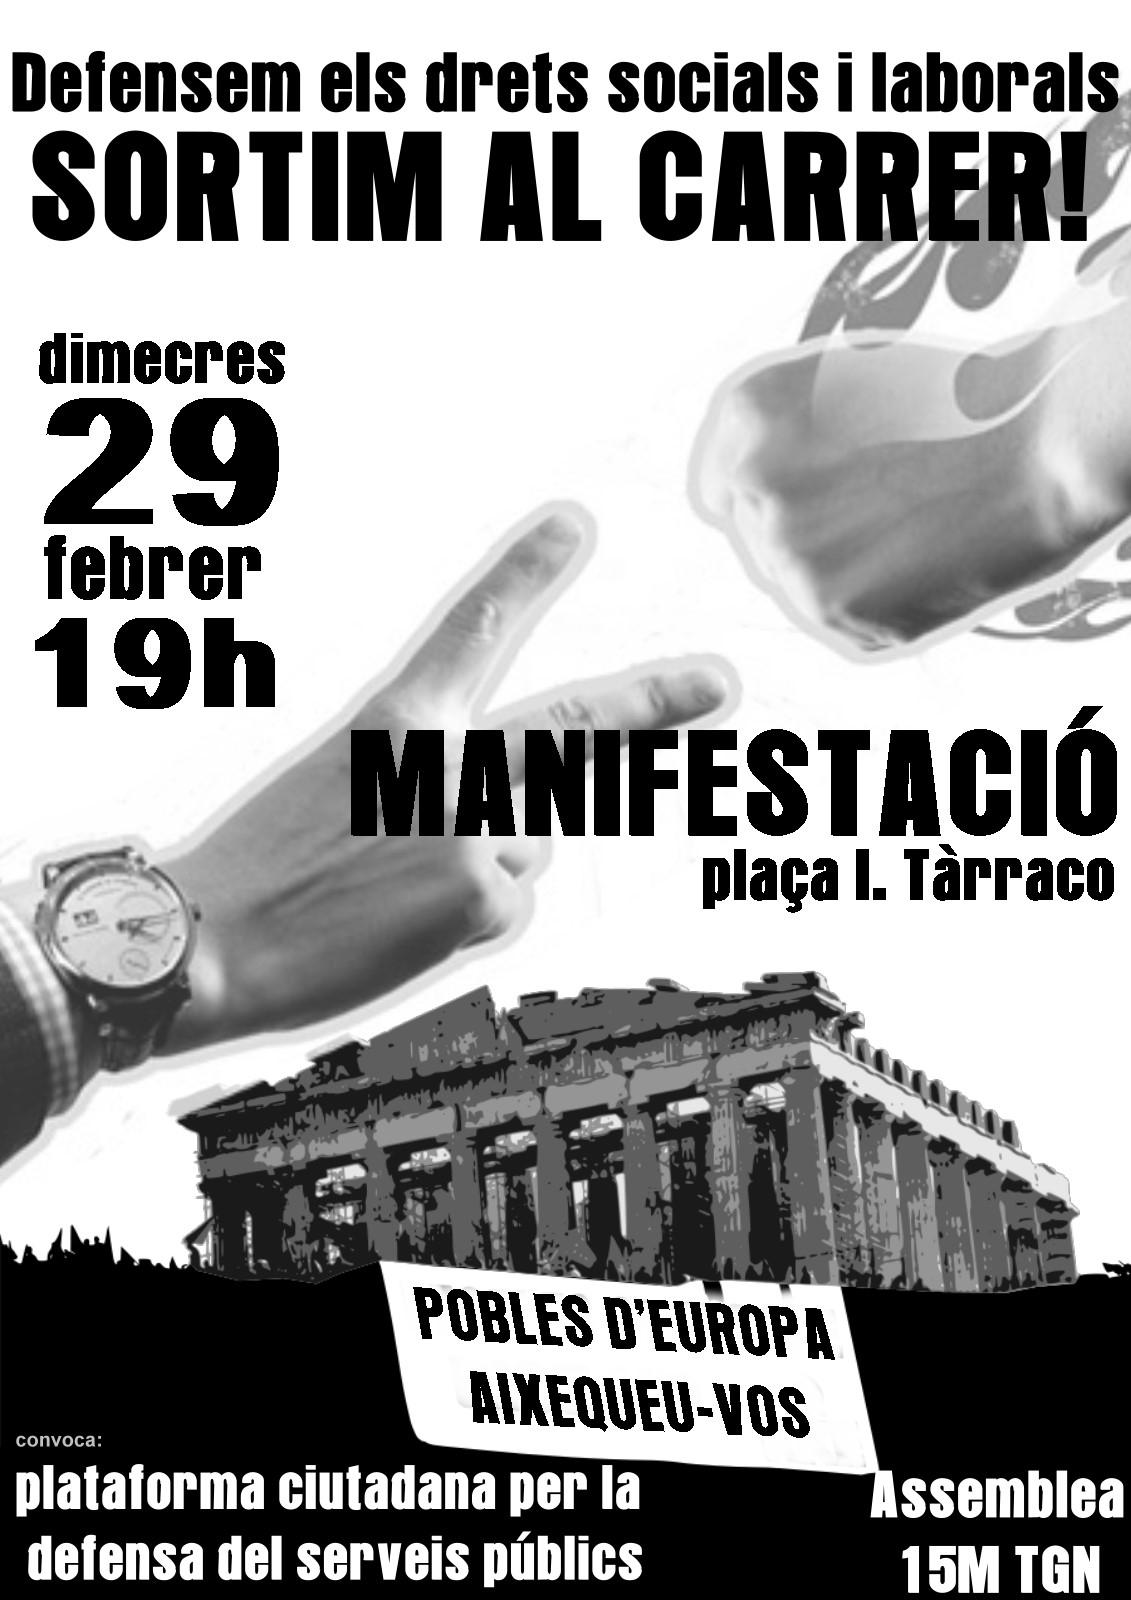 cartell 29 blanc i negre